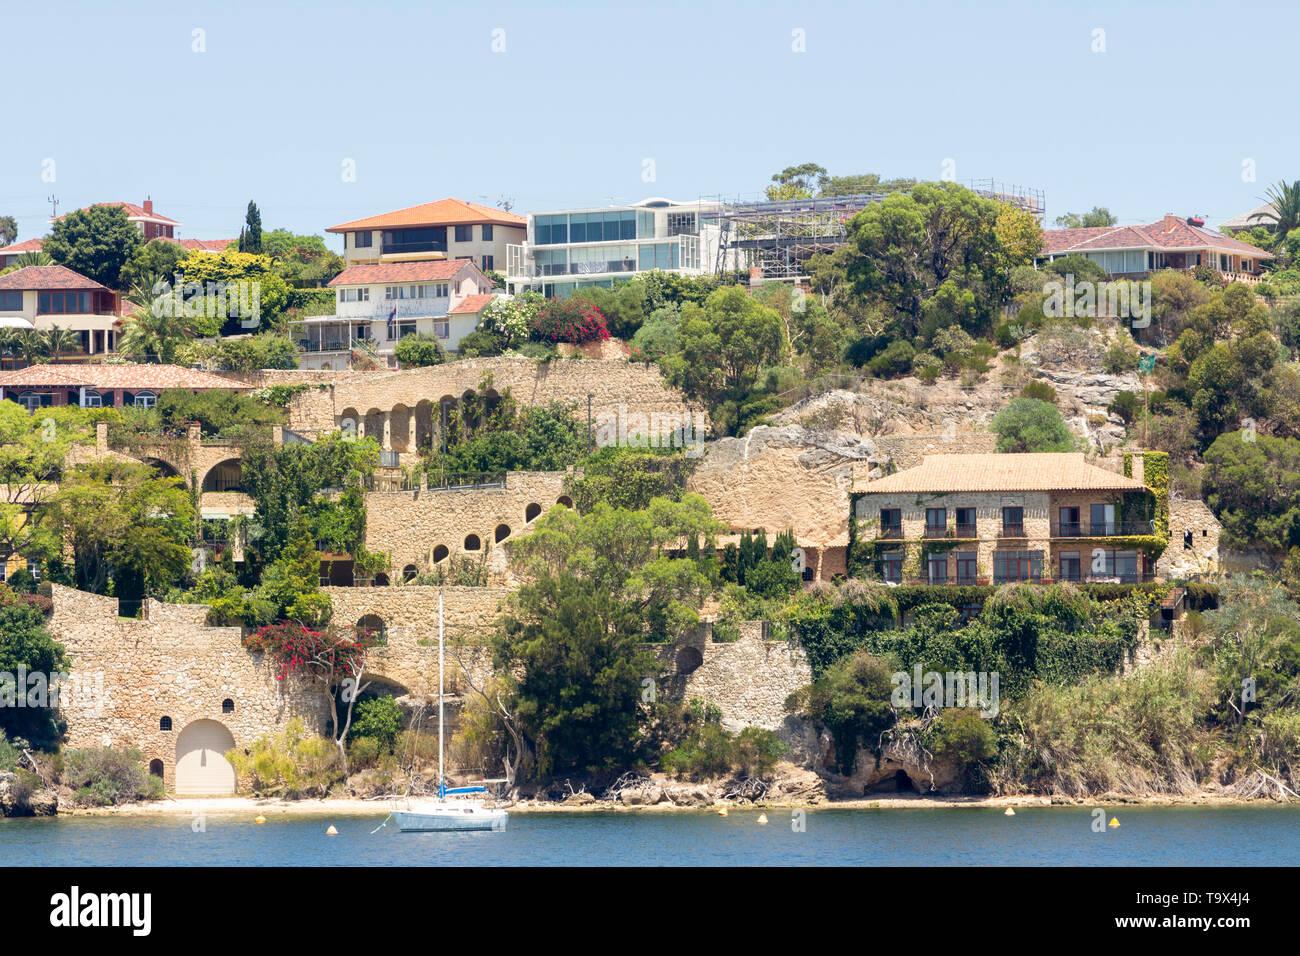 Perth, Western Australia State/Australia 01/21/2013. Million dollar homes on the Swan River, Mosman Park Western Australia. - Stock Image